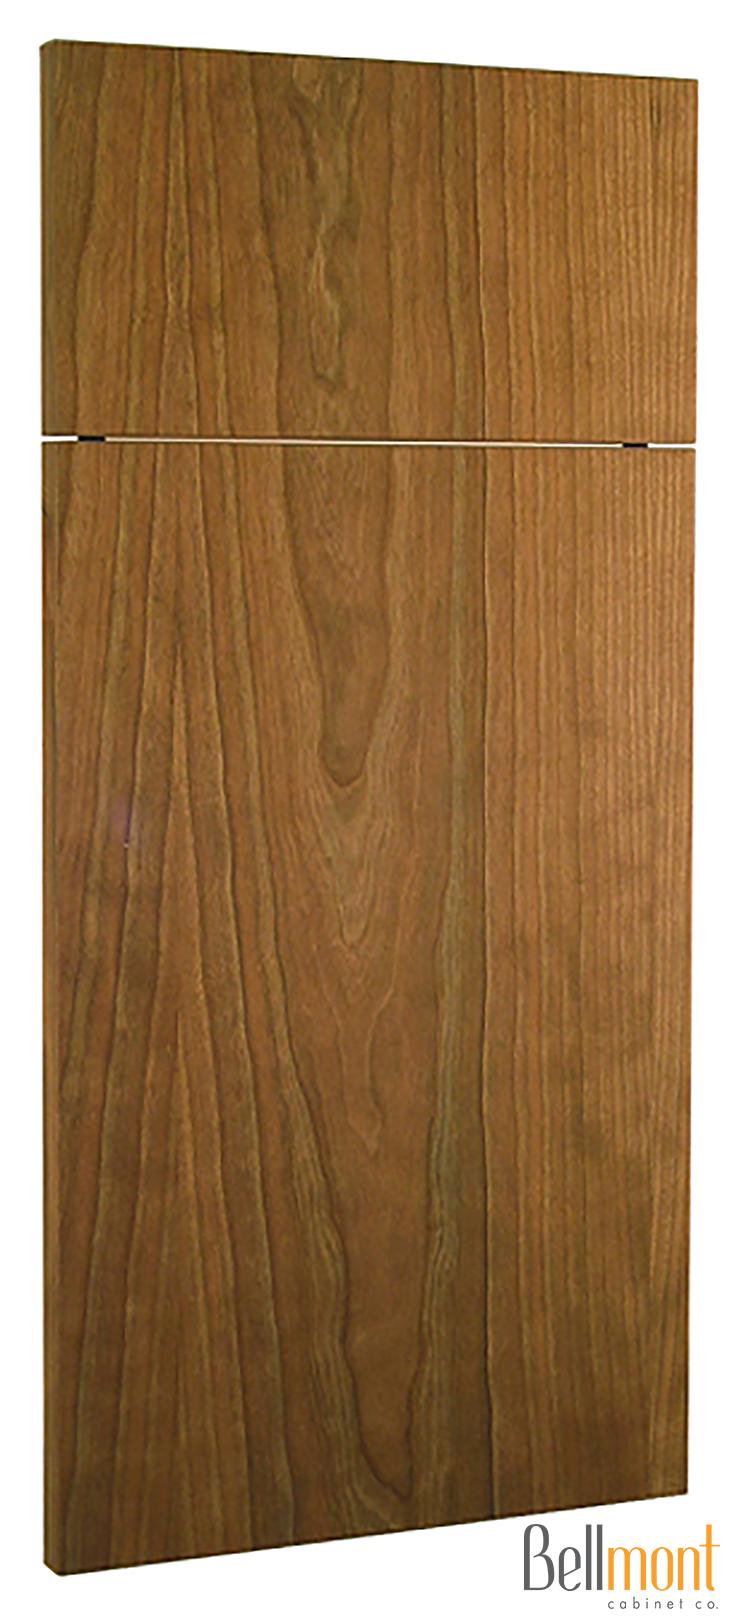 Bellmont cabinet co series stockholm cherry natural door